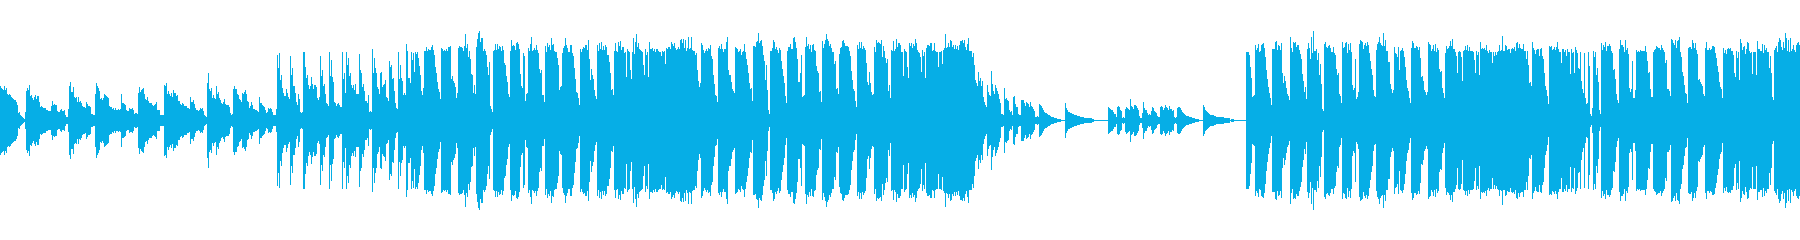 【Synthe抜】クラシックEDMの再生済みの波形